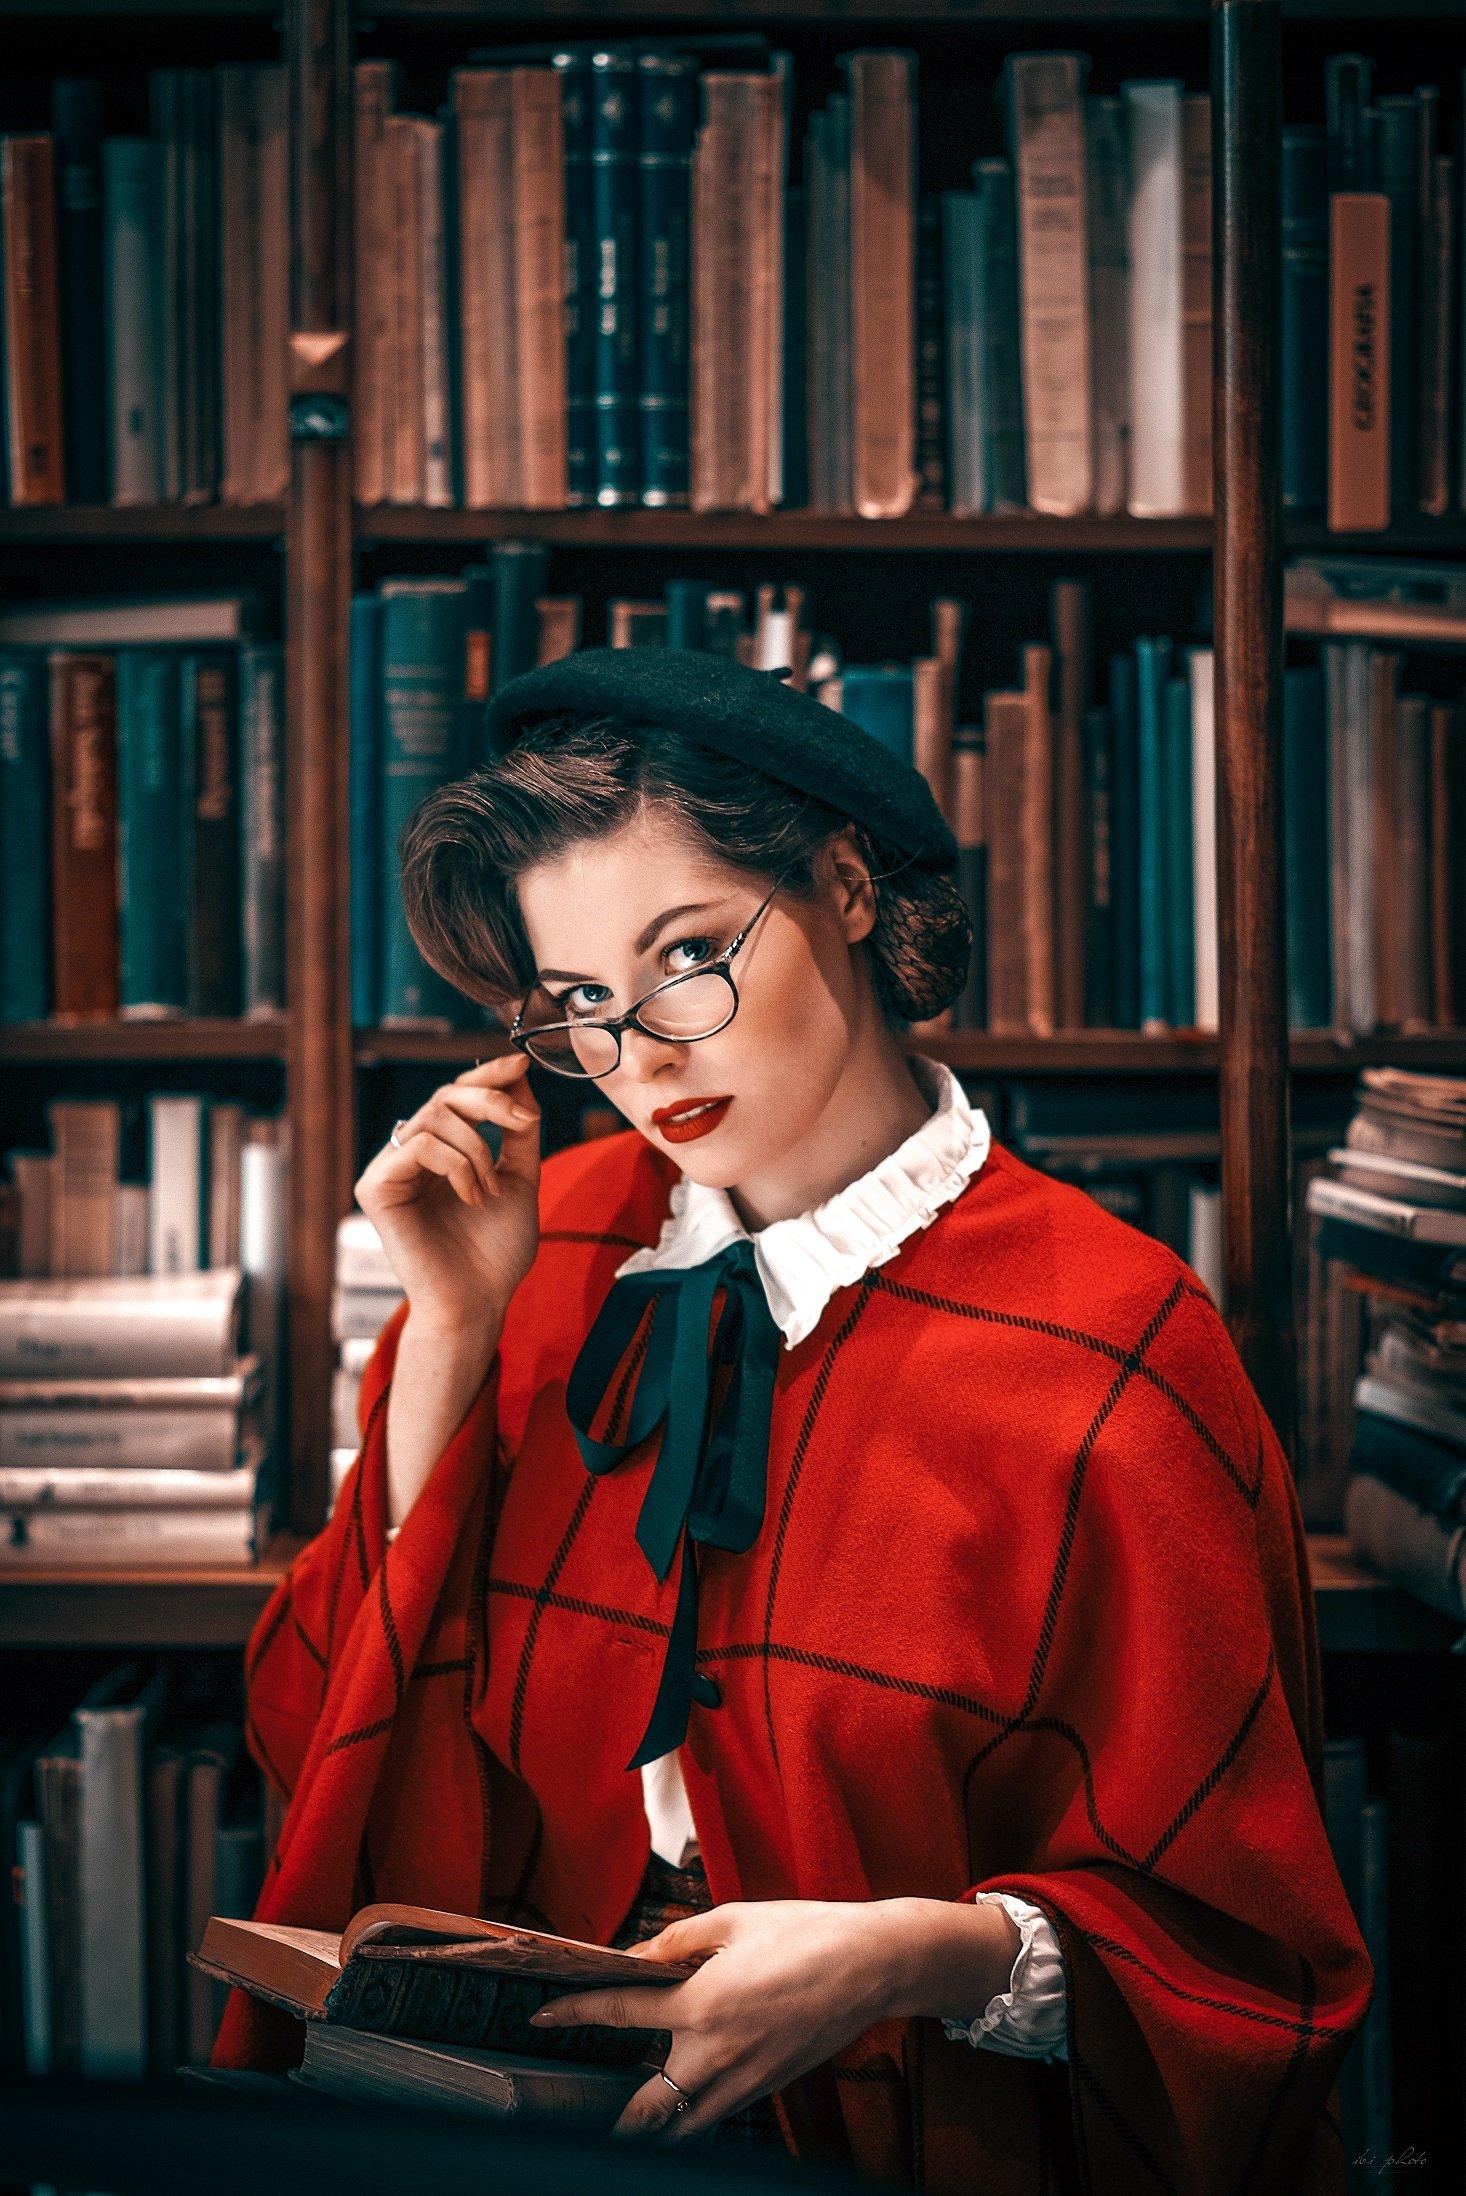 woman portrait retro library, ibiphoto